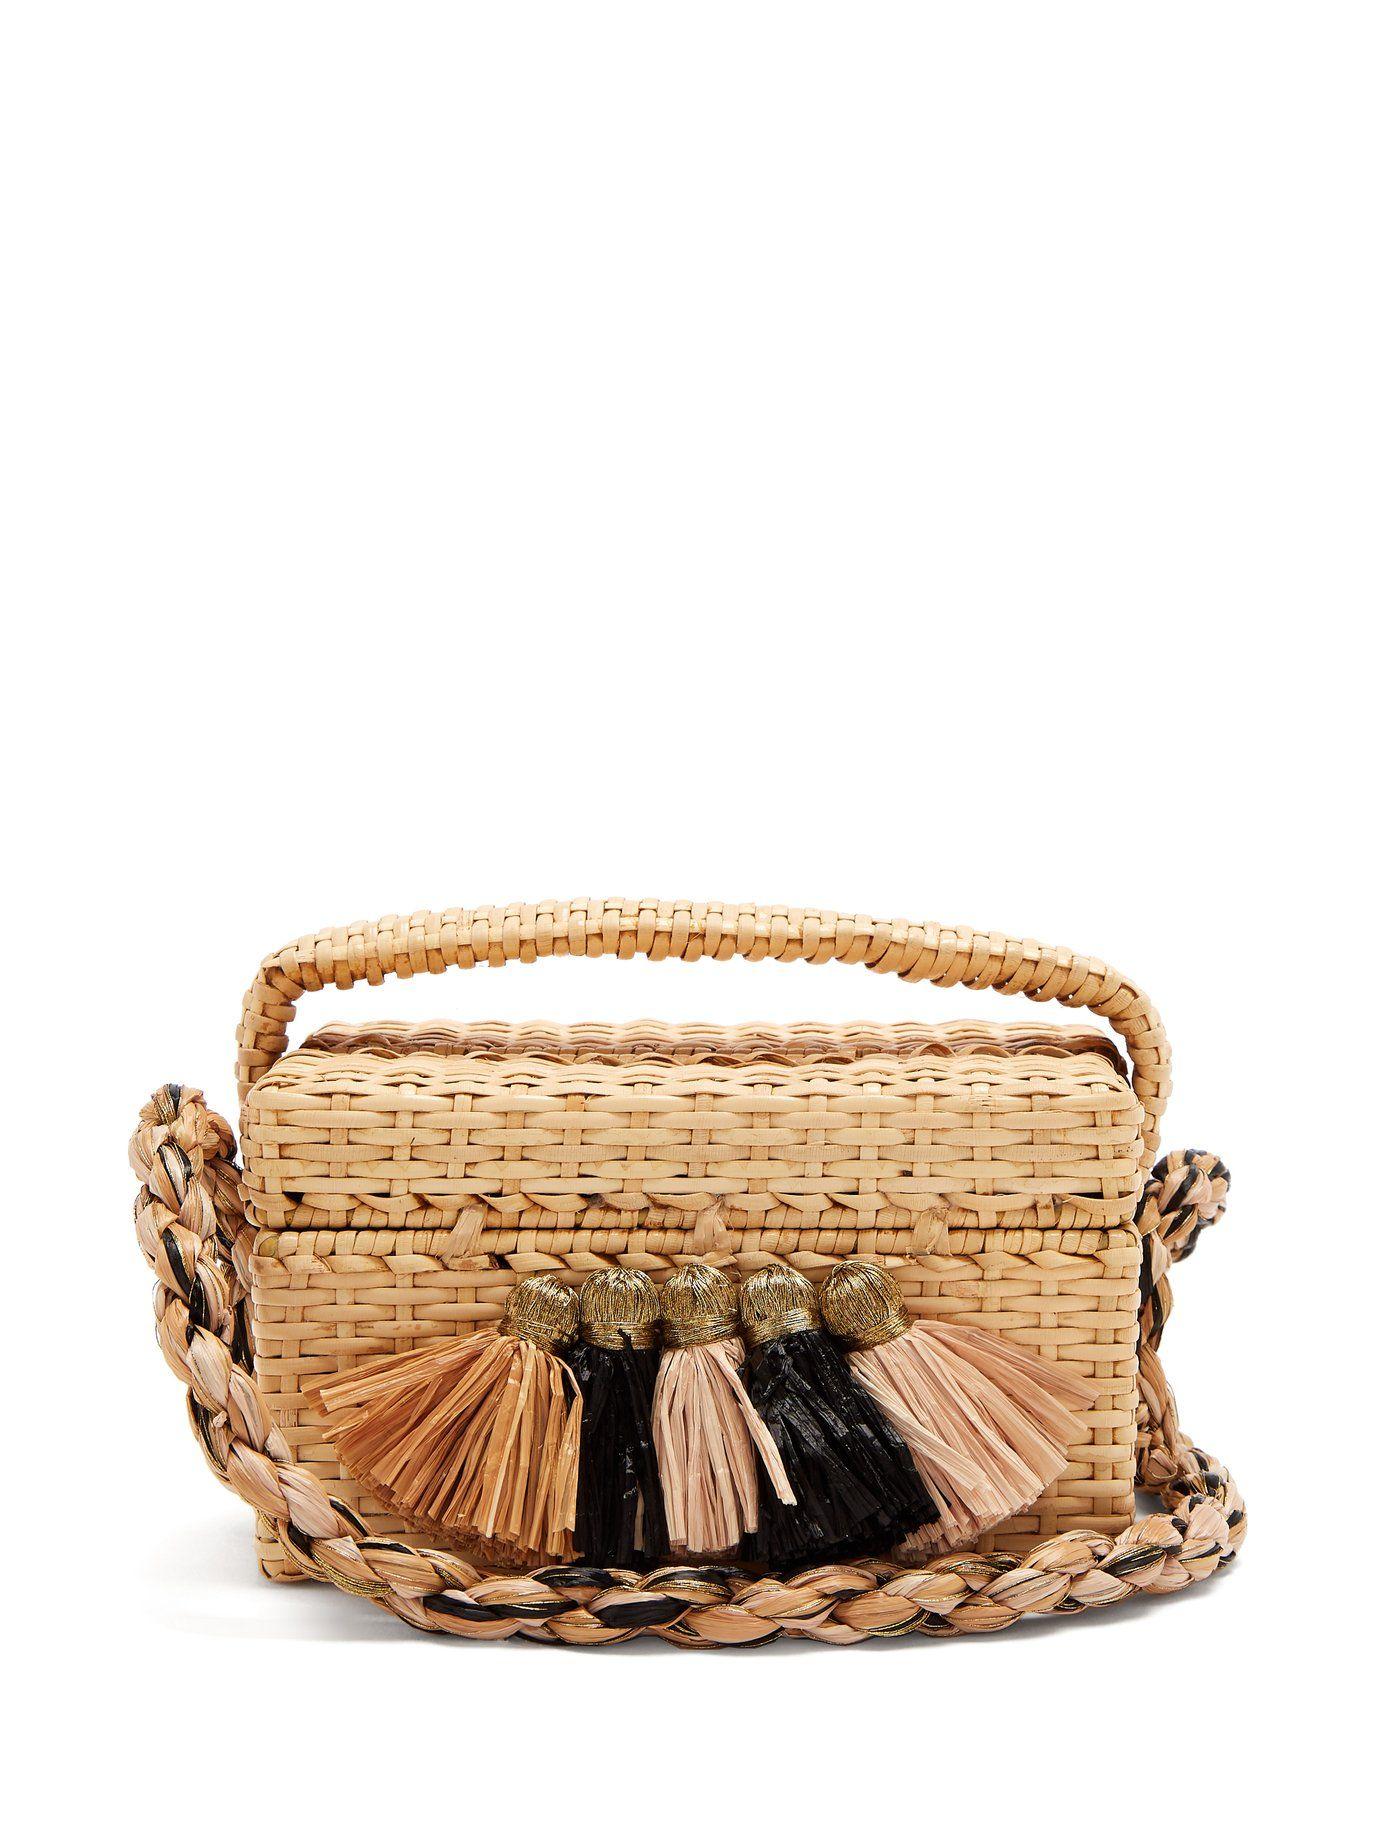 Bag Tassel Straw Trimmed Sanayi 313 Matchesfashion Carolsello wZtnBPq4ZO